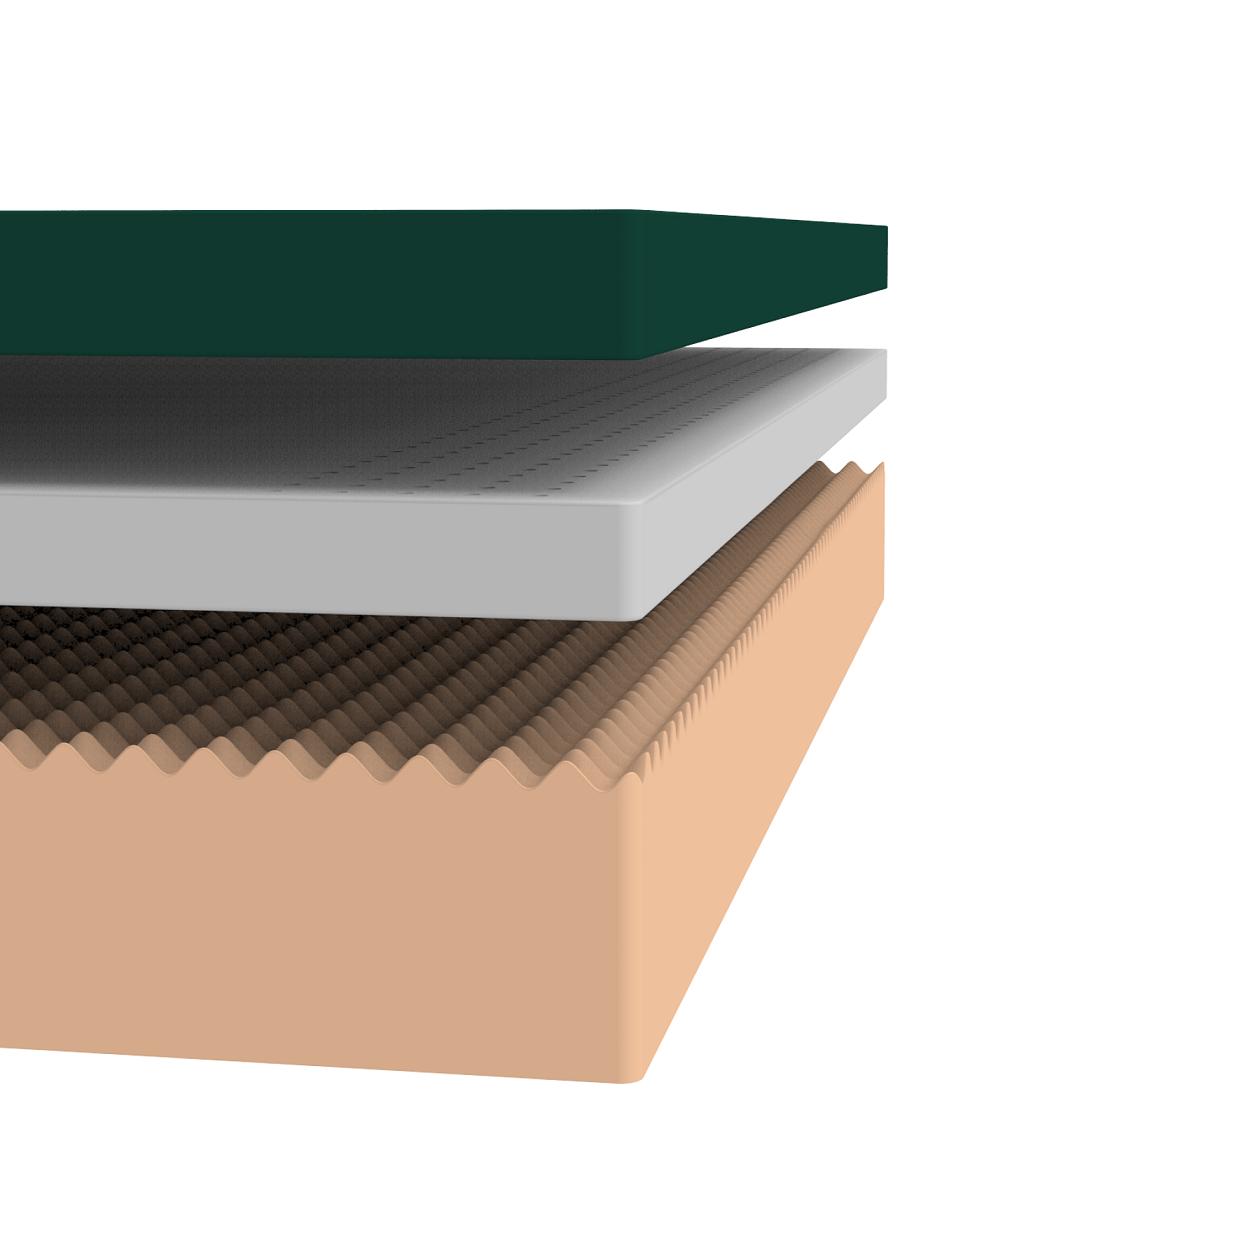 Green Tea Memory Foam Pressure Relief Mattress Zinus